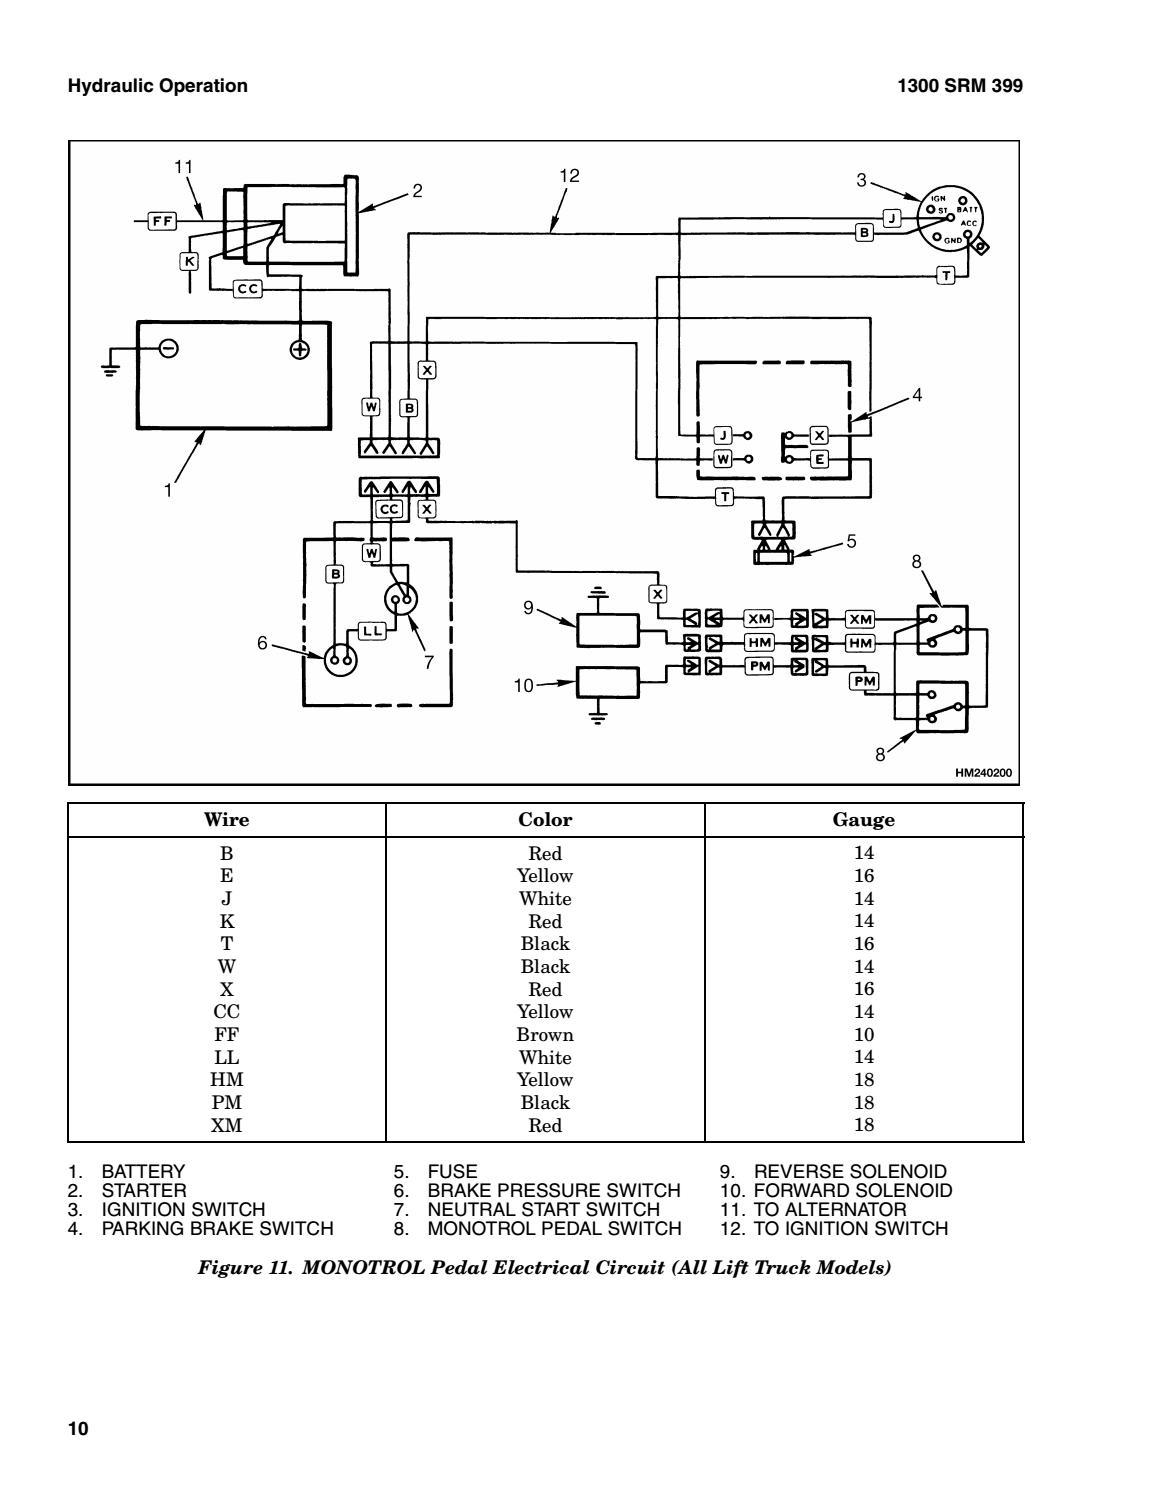 Hyster 50 Wiring Diagram - Turf Tiger Scag Wiring Diagram -  doorchime.ati-loro.jeanjaures37.fr | Hyster H100xm Wiring Diagram |  | Wiring Diagram Resource